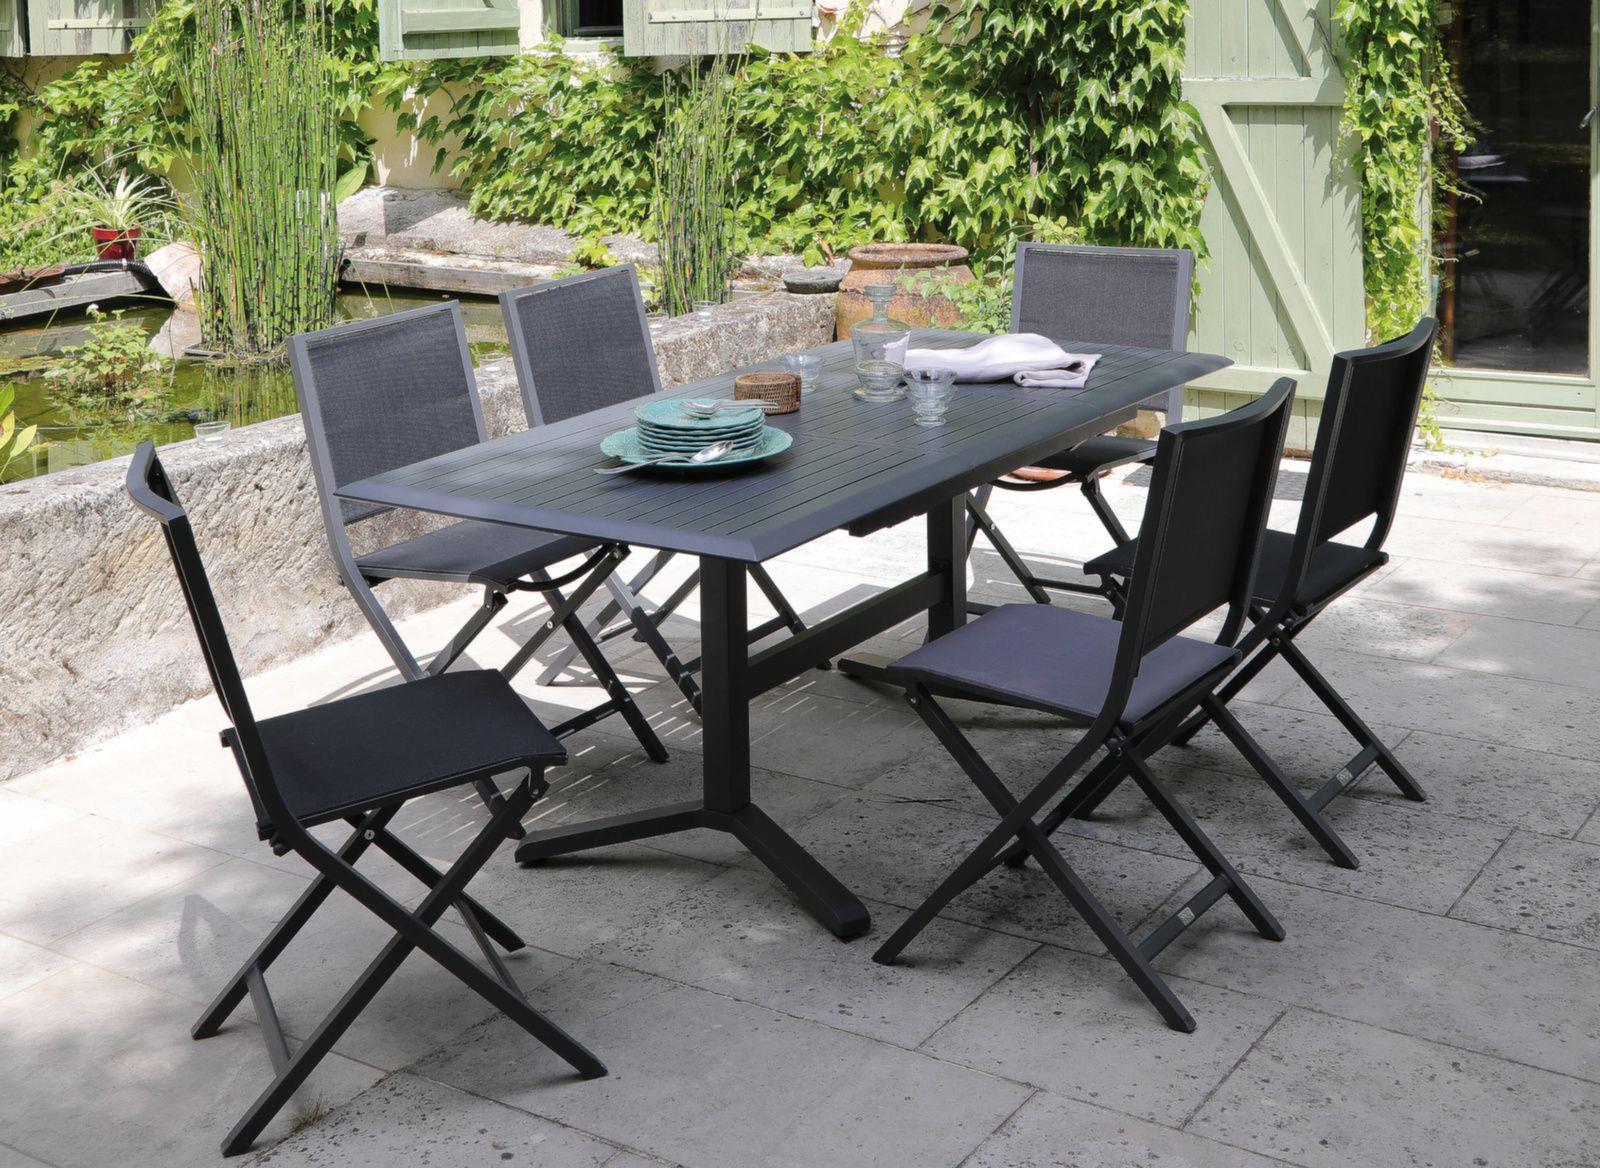 Table Sotta 130 180 Cm Table De Jardin Bois Aluminium Resine